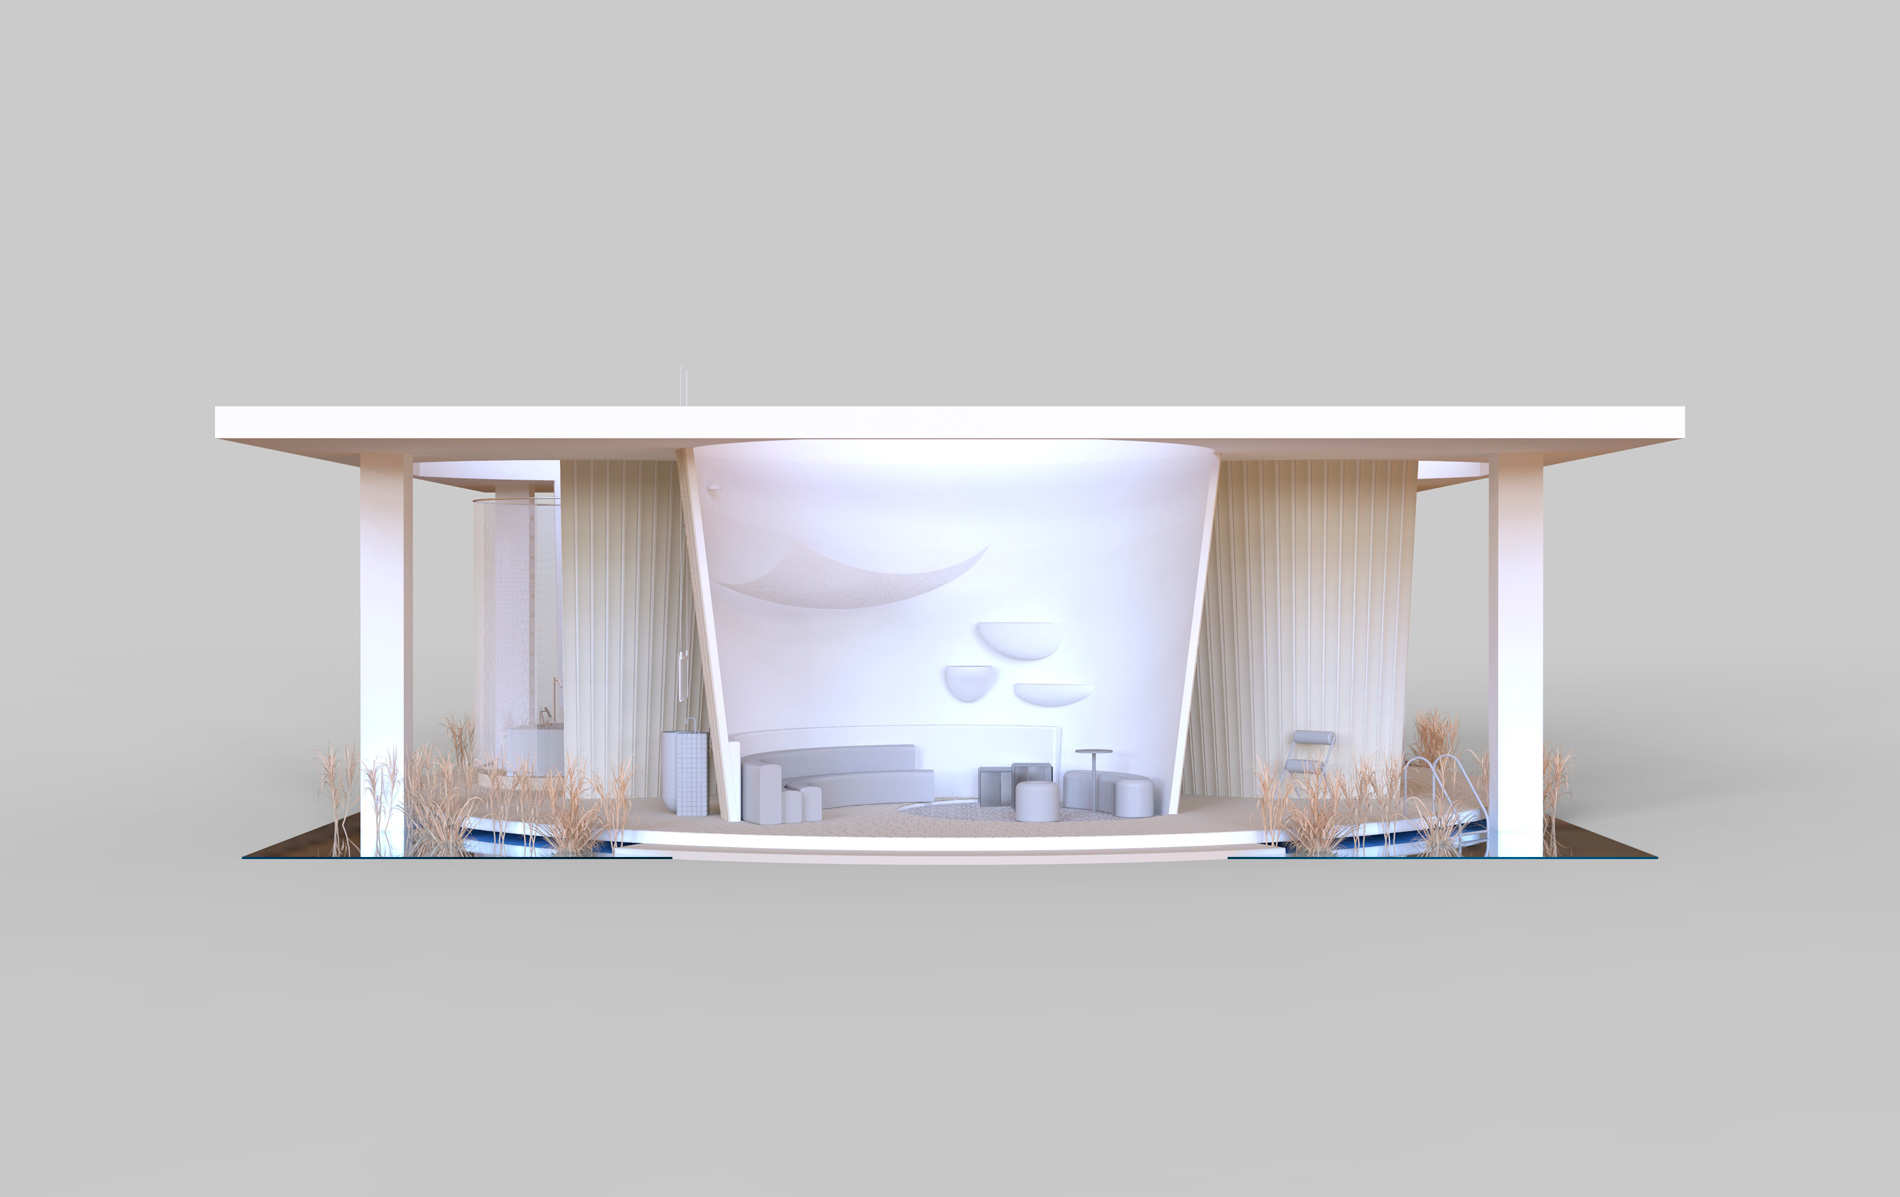 Das Haus 2020 x MUT Design